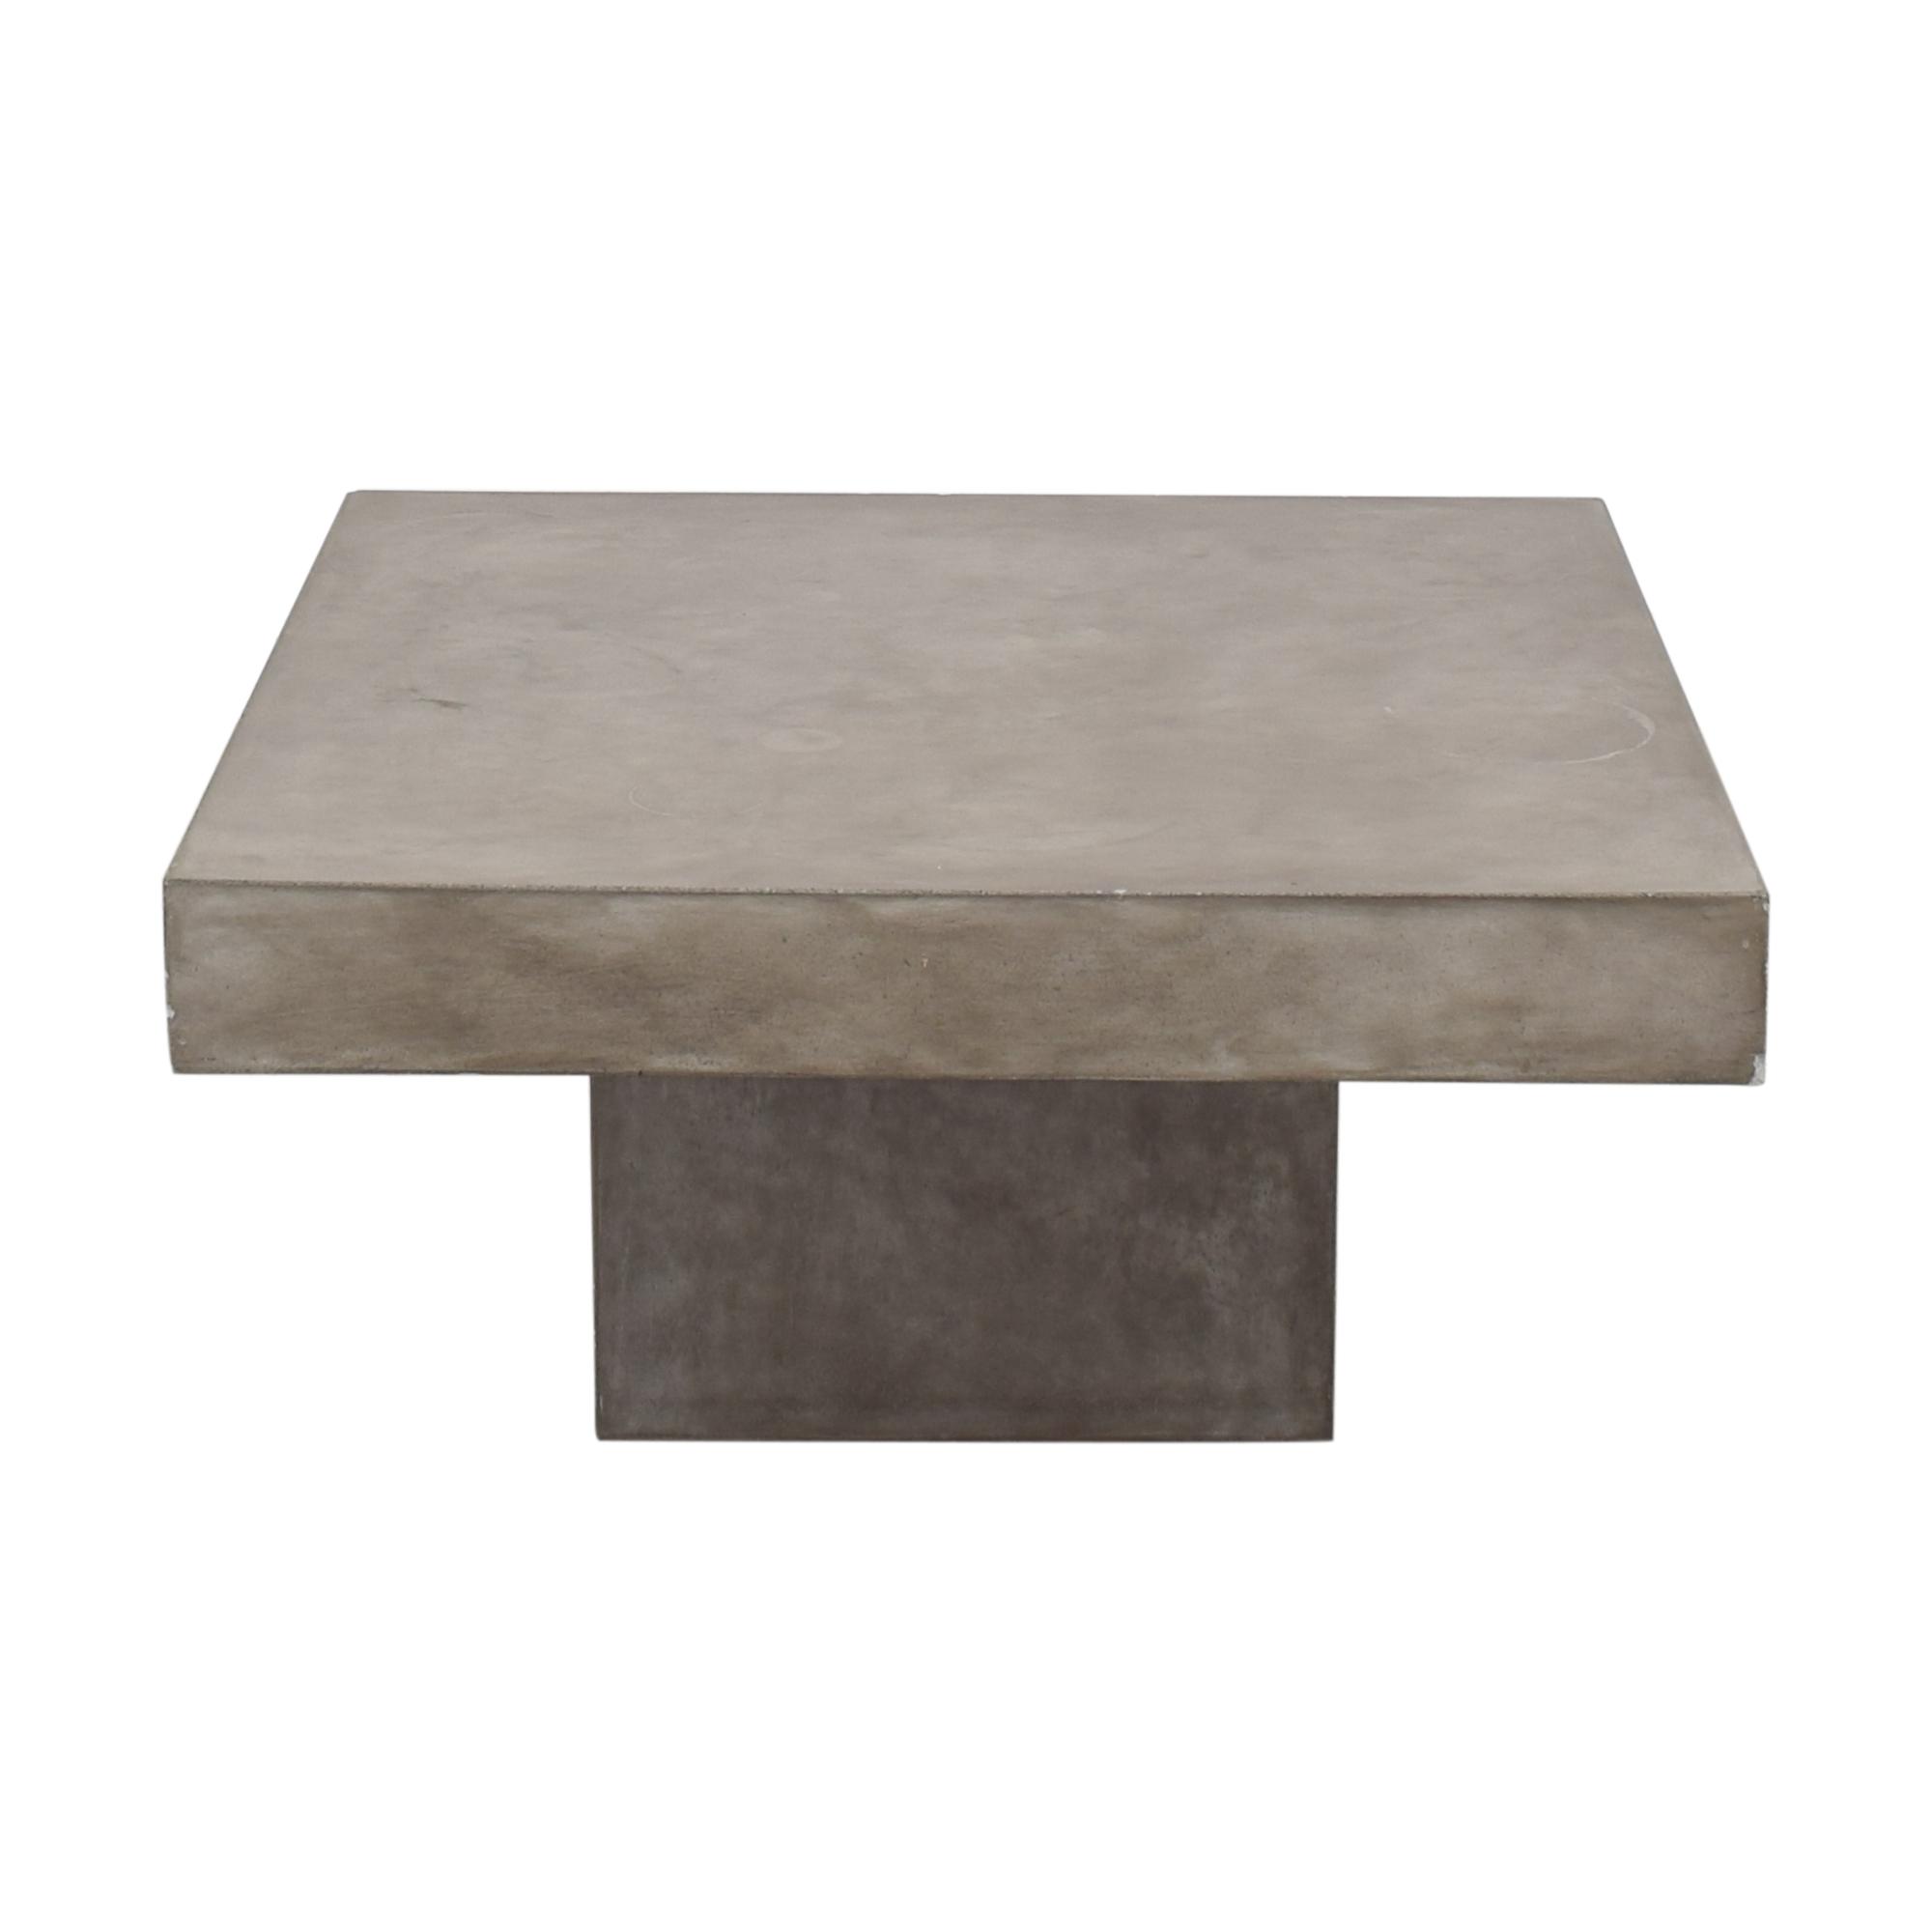 CB2 CB2 Element Square Coffee Table grey